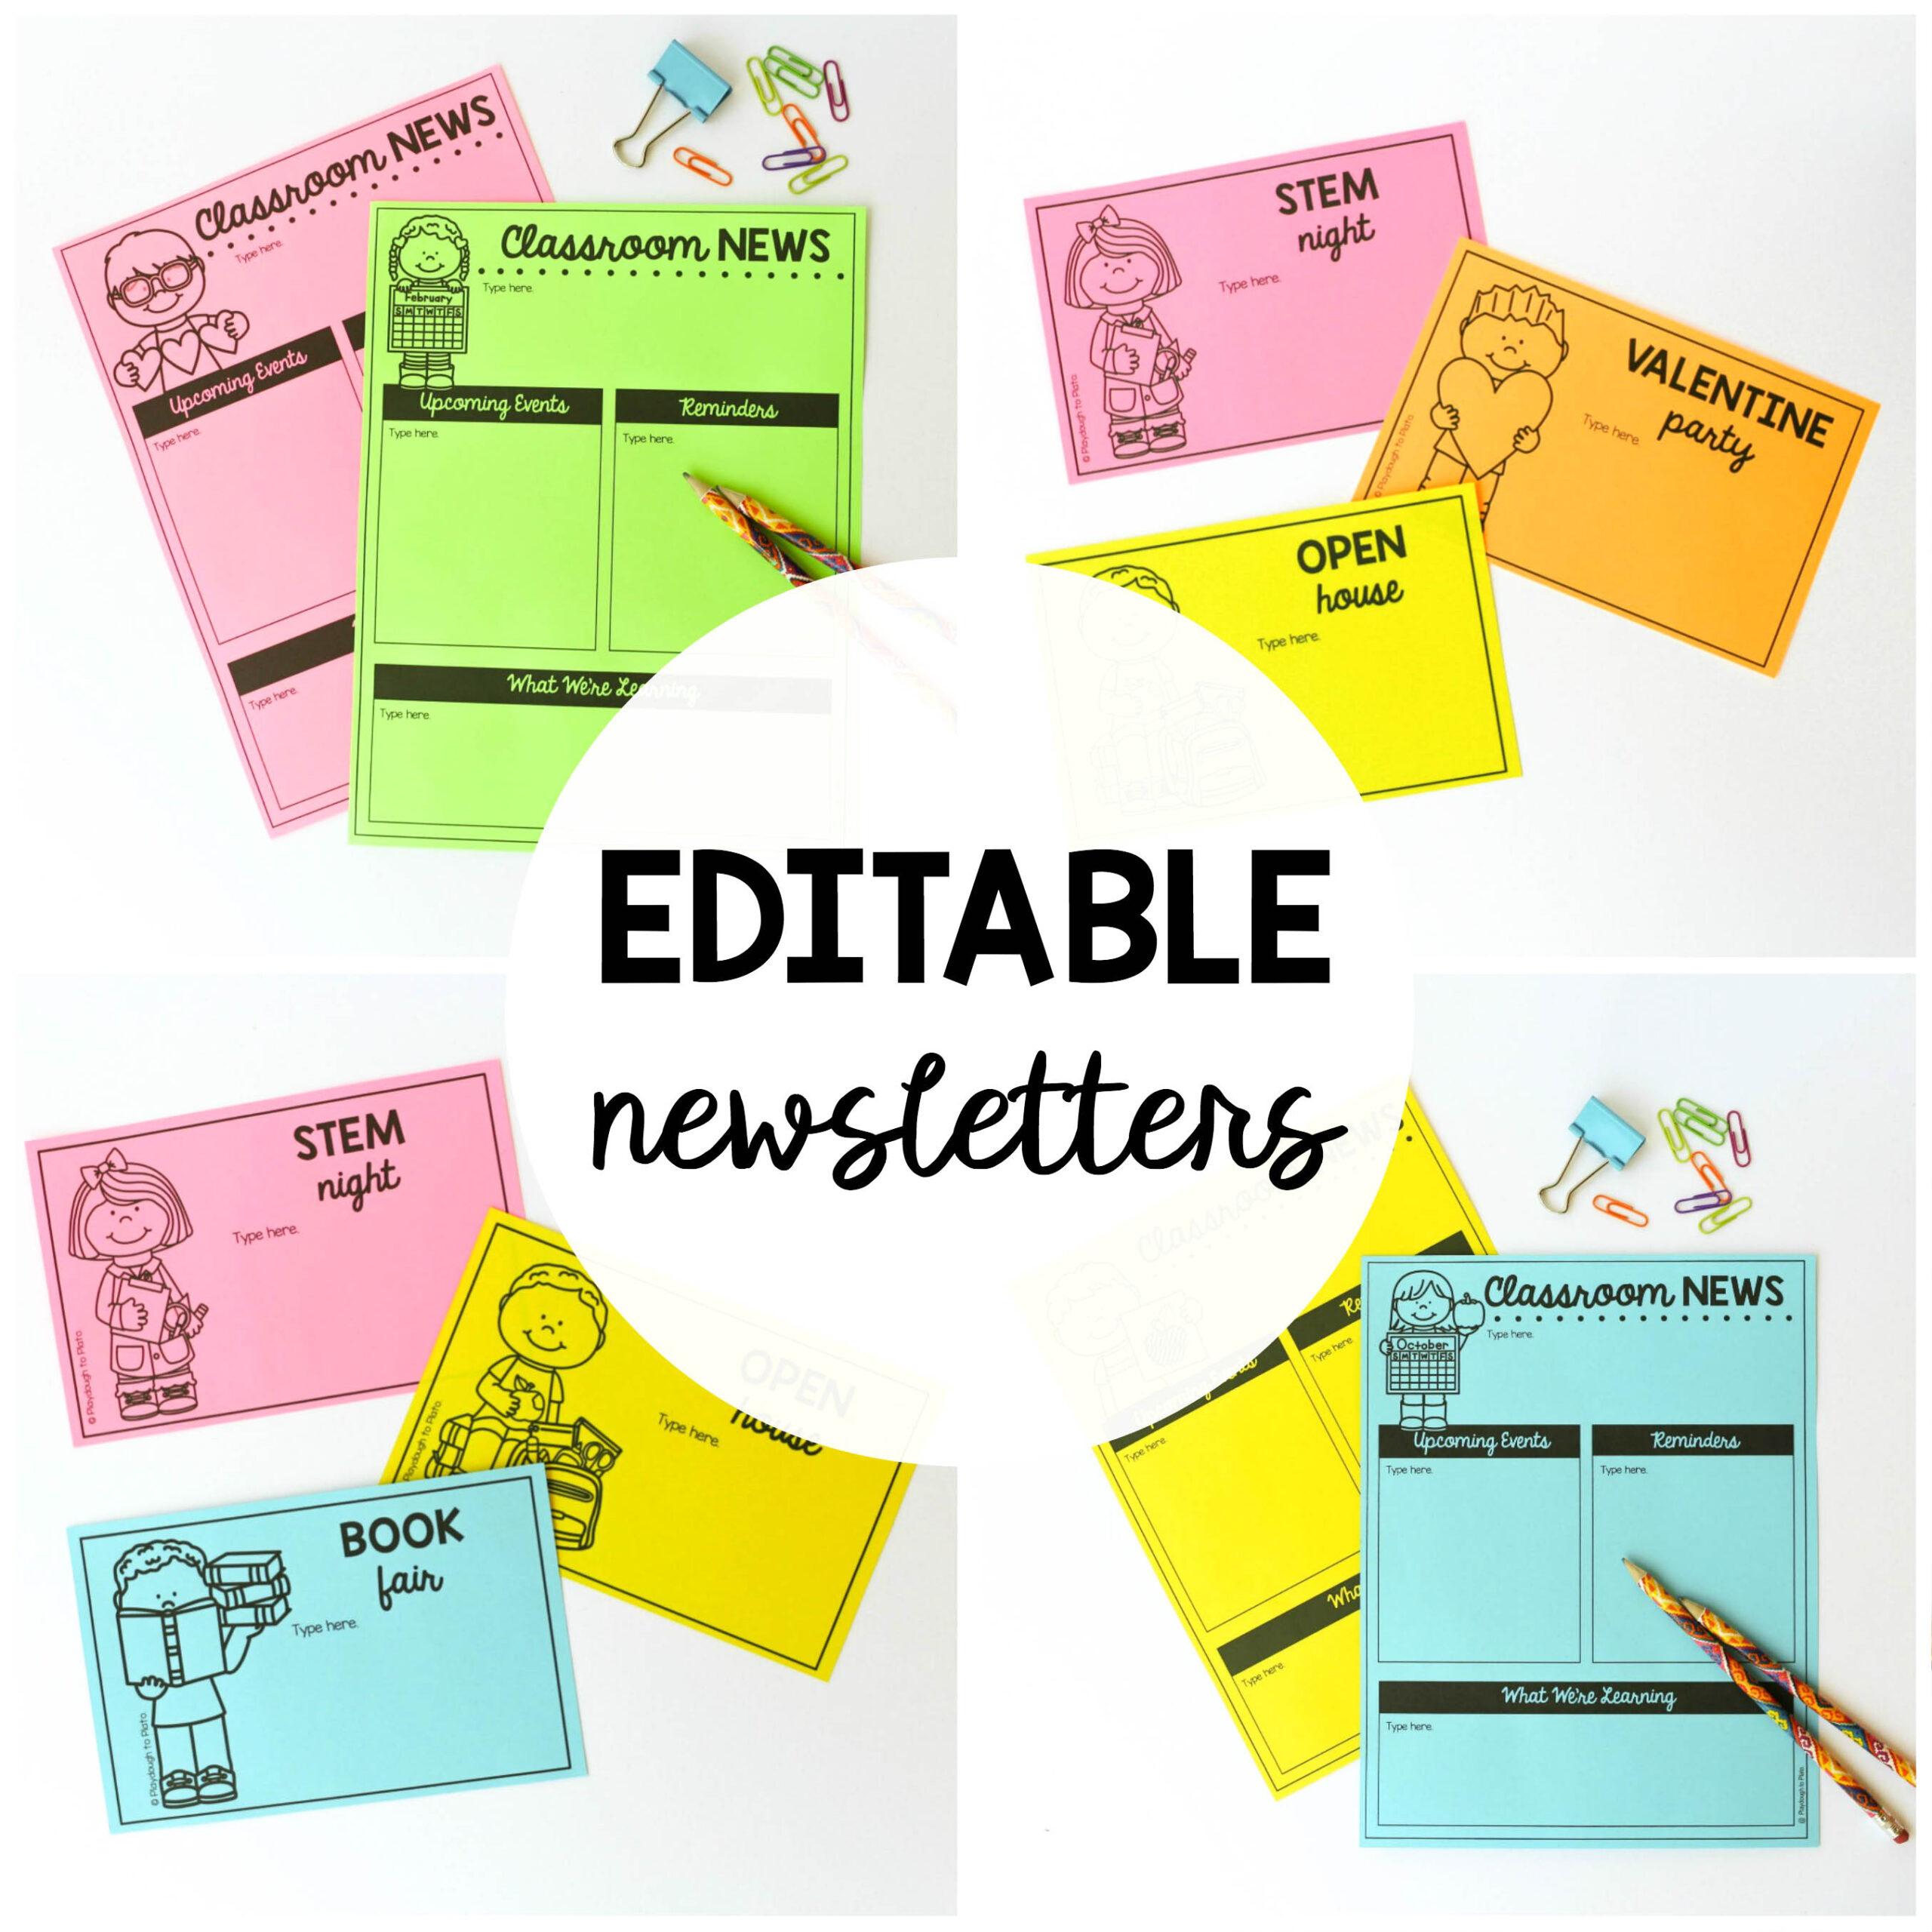 Editable Newsletter Templates The Stem Laboratory